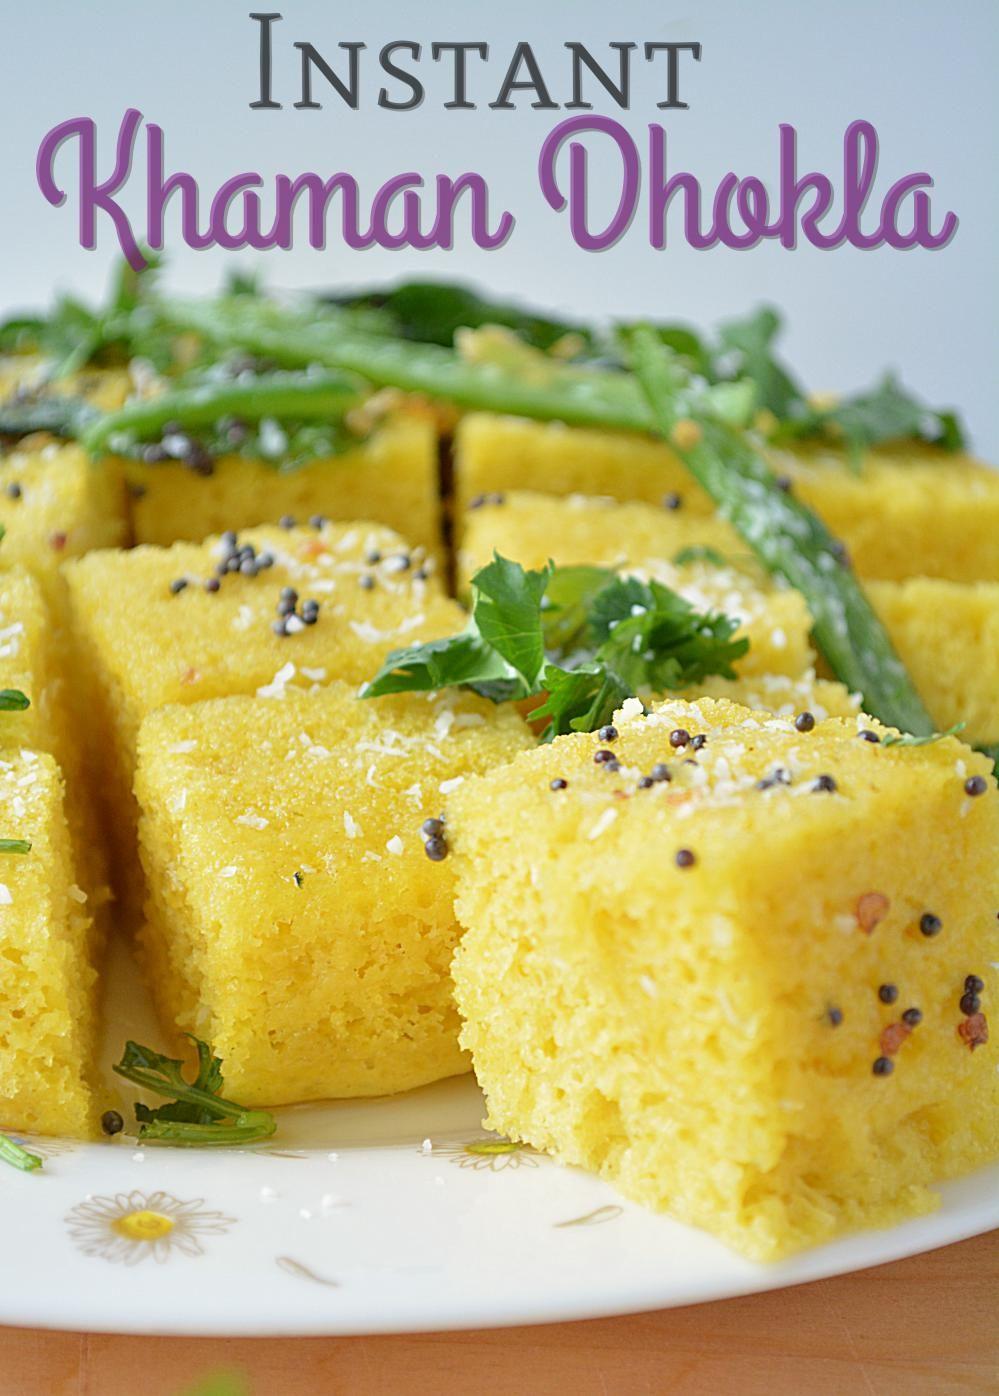 Instant khaman dhokla healthy recipes pinterest snacks gram instant khaman dhokla gujarati recipesindian forumfinder Choice Image